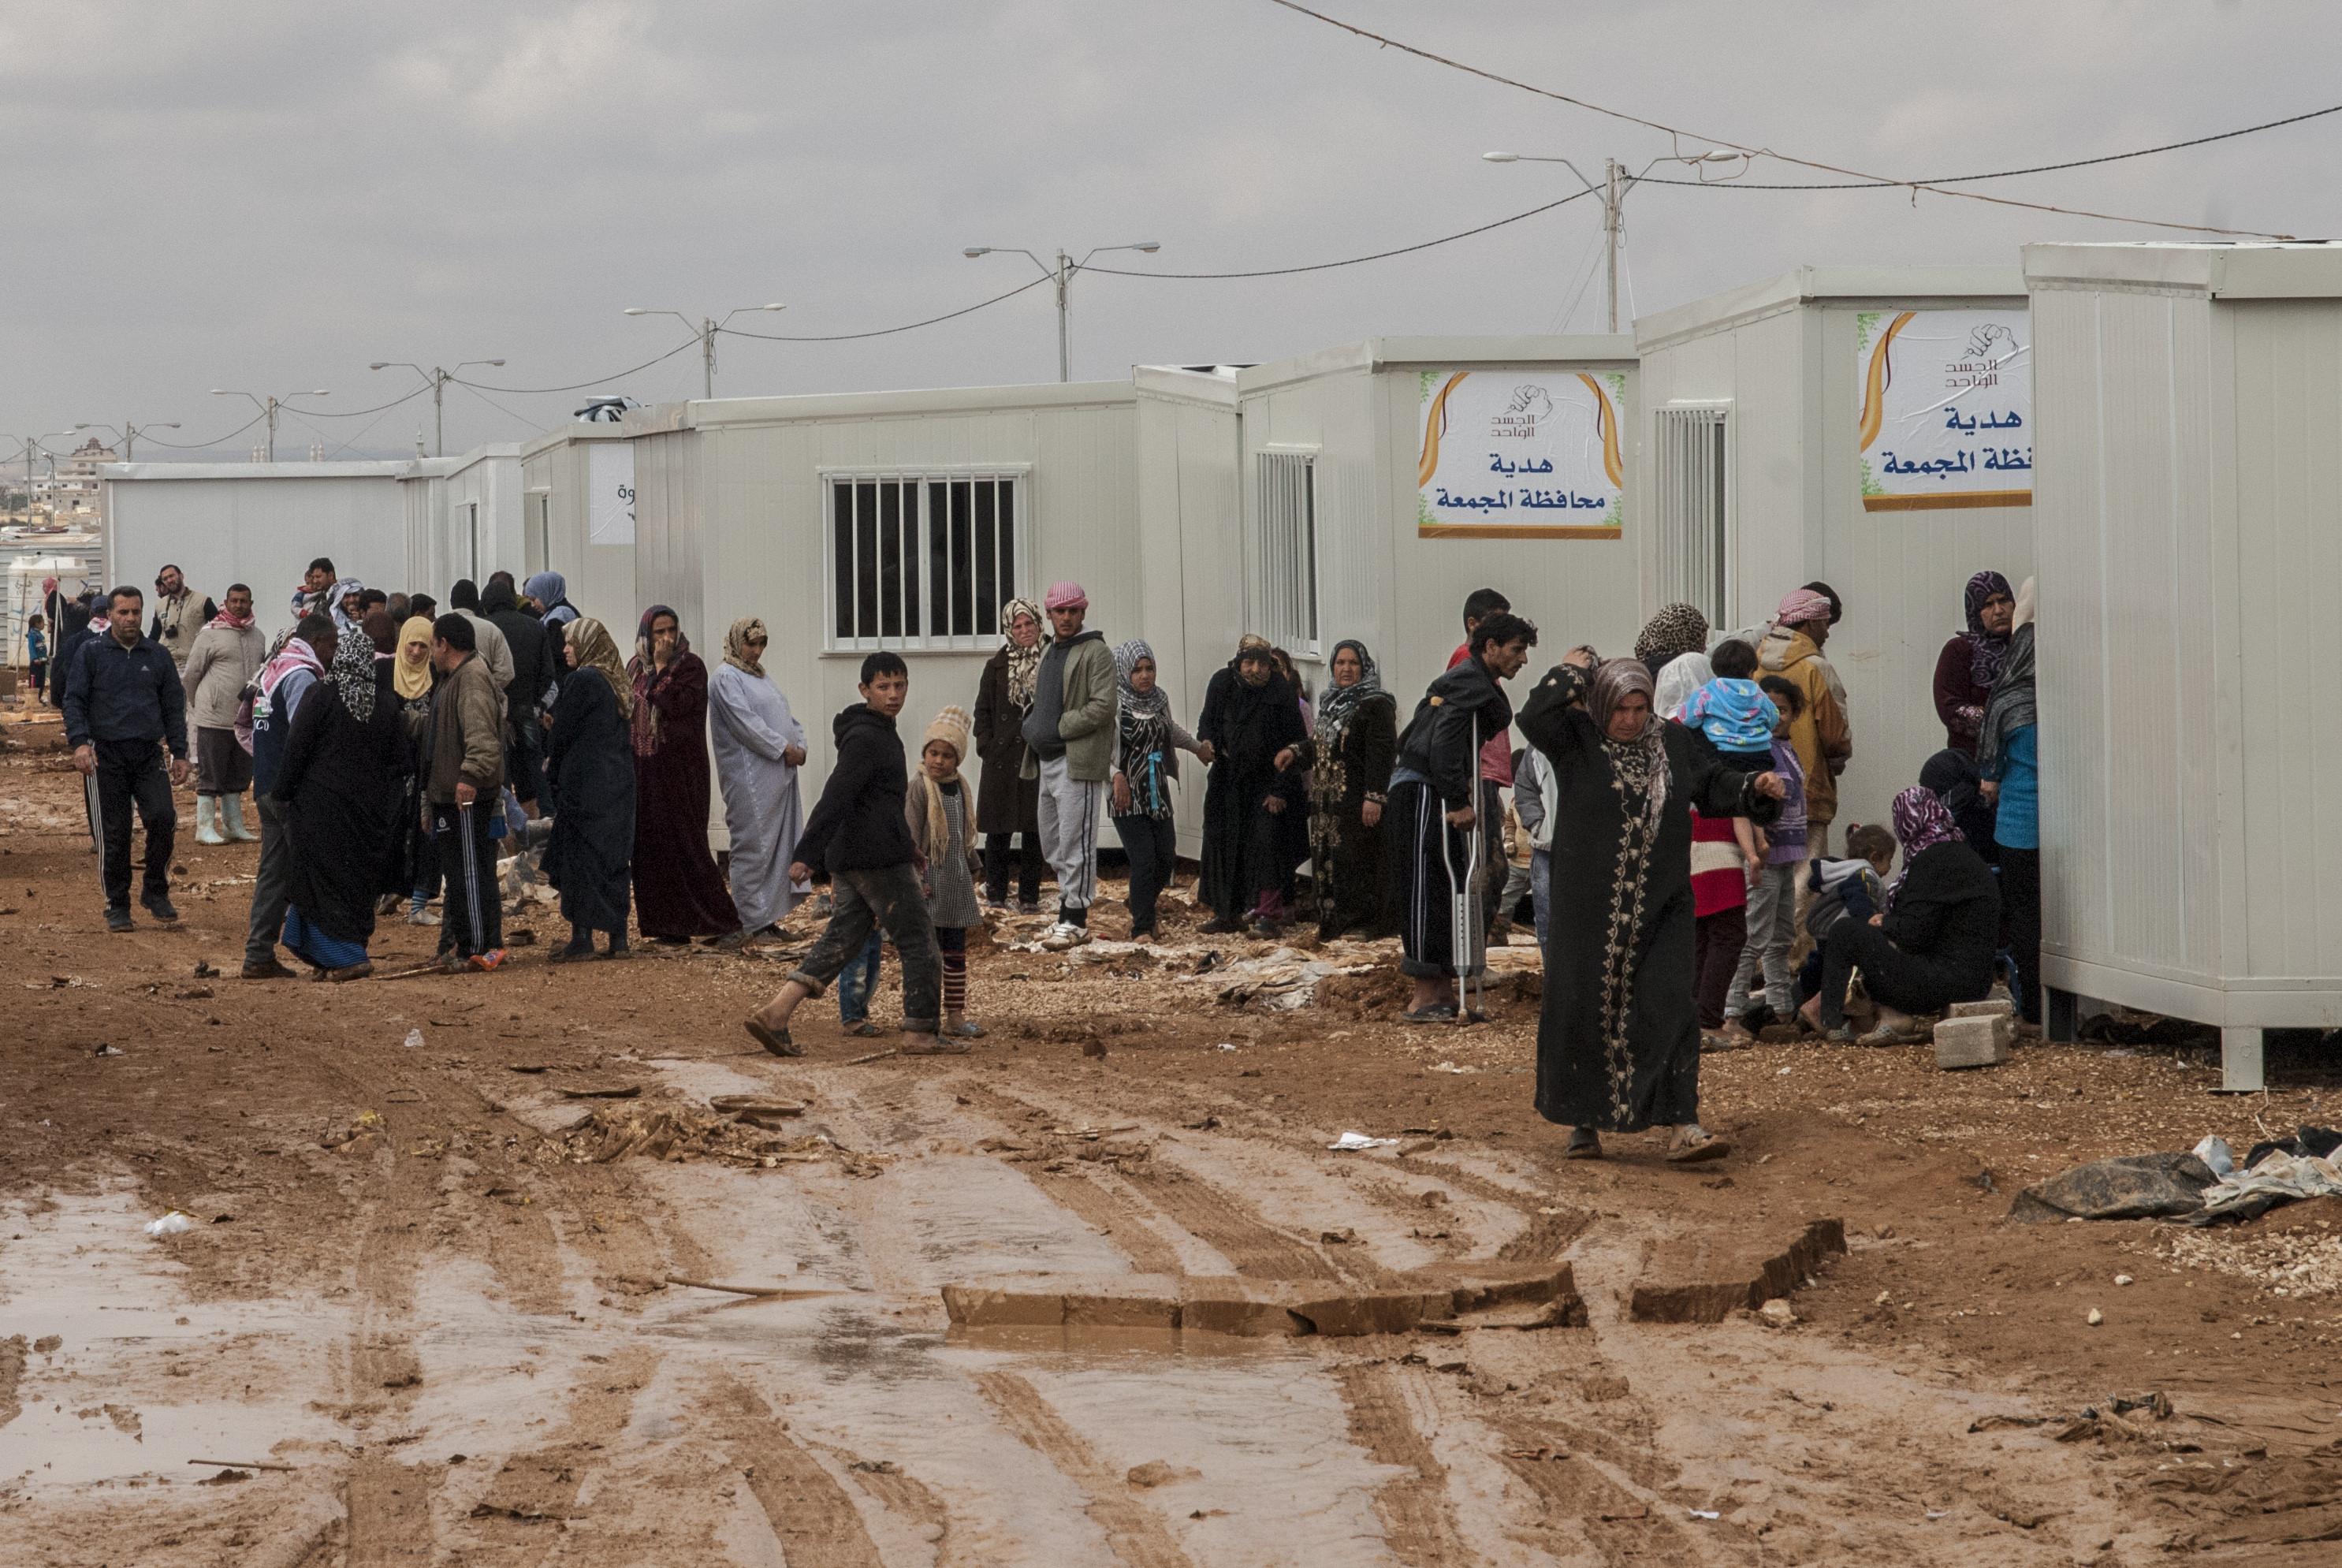 camp zaatari refugees